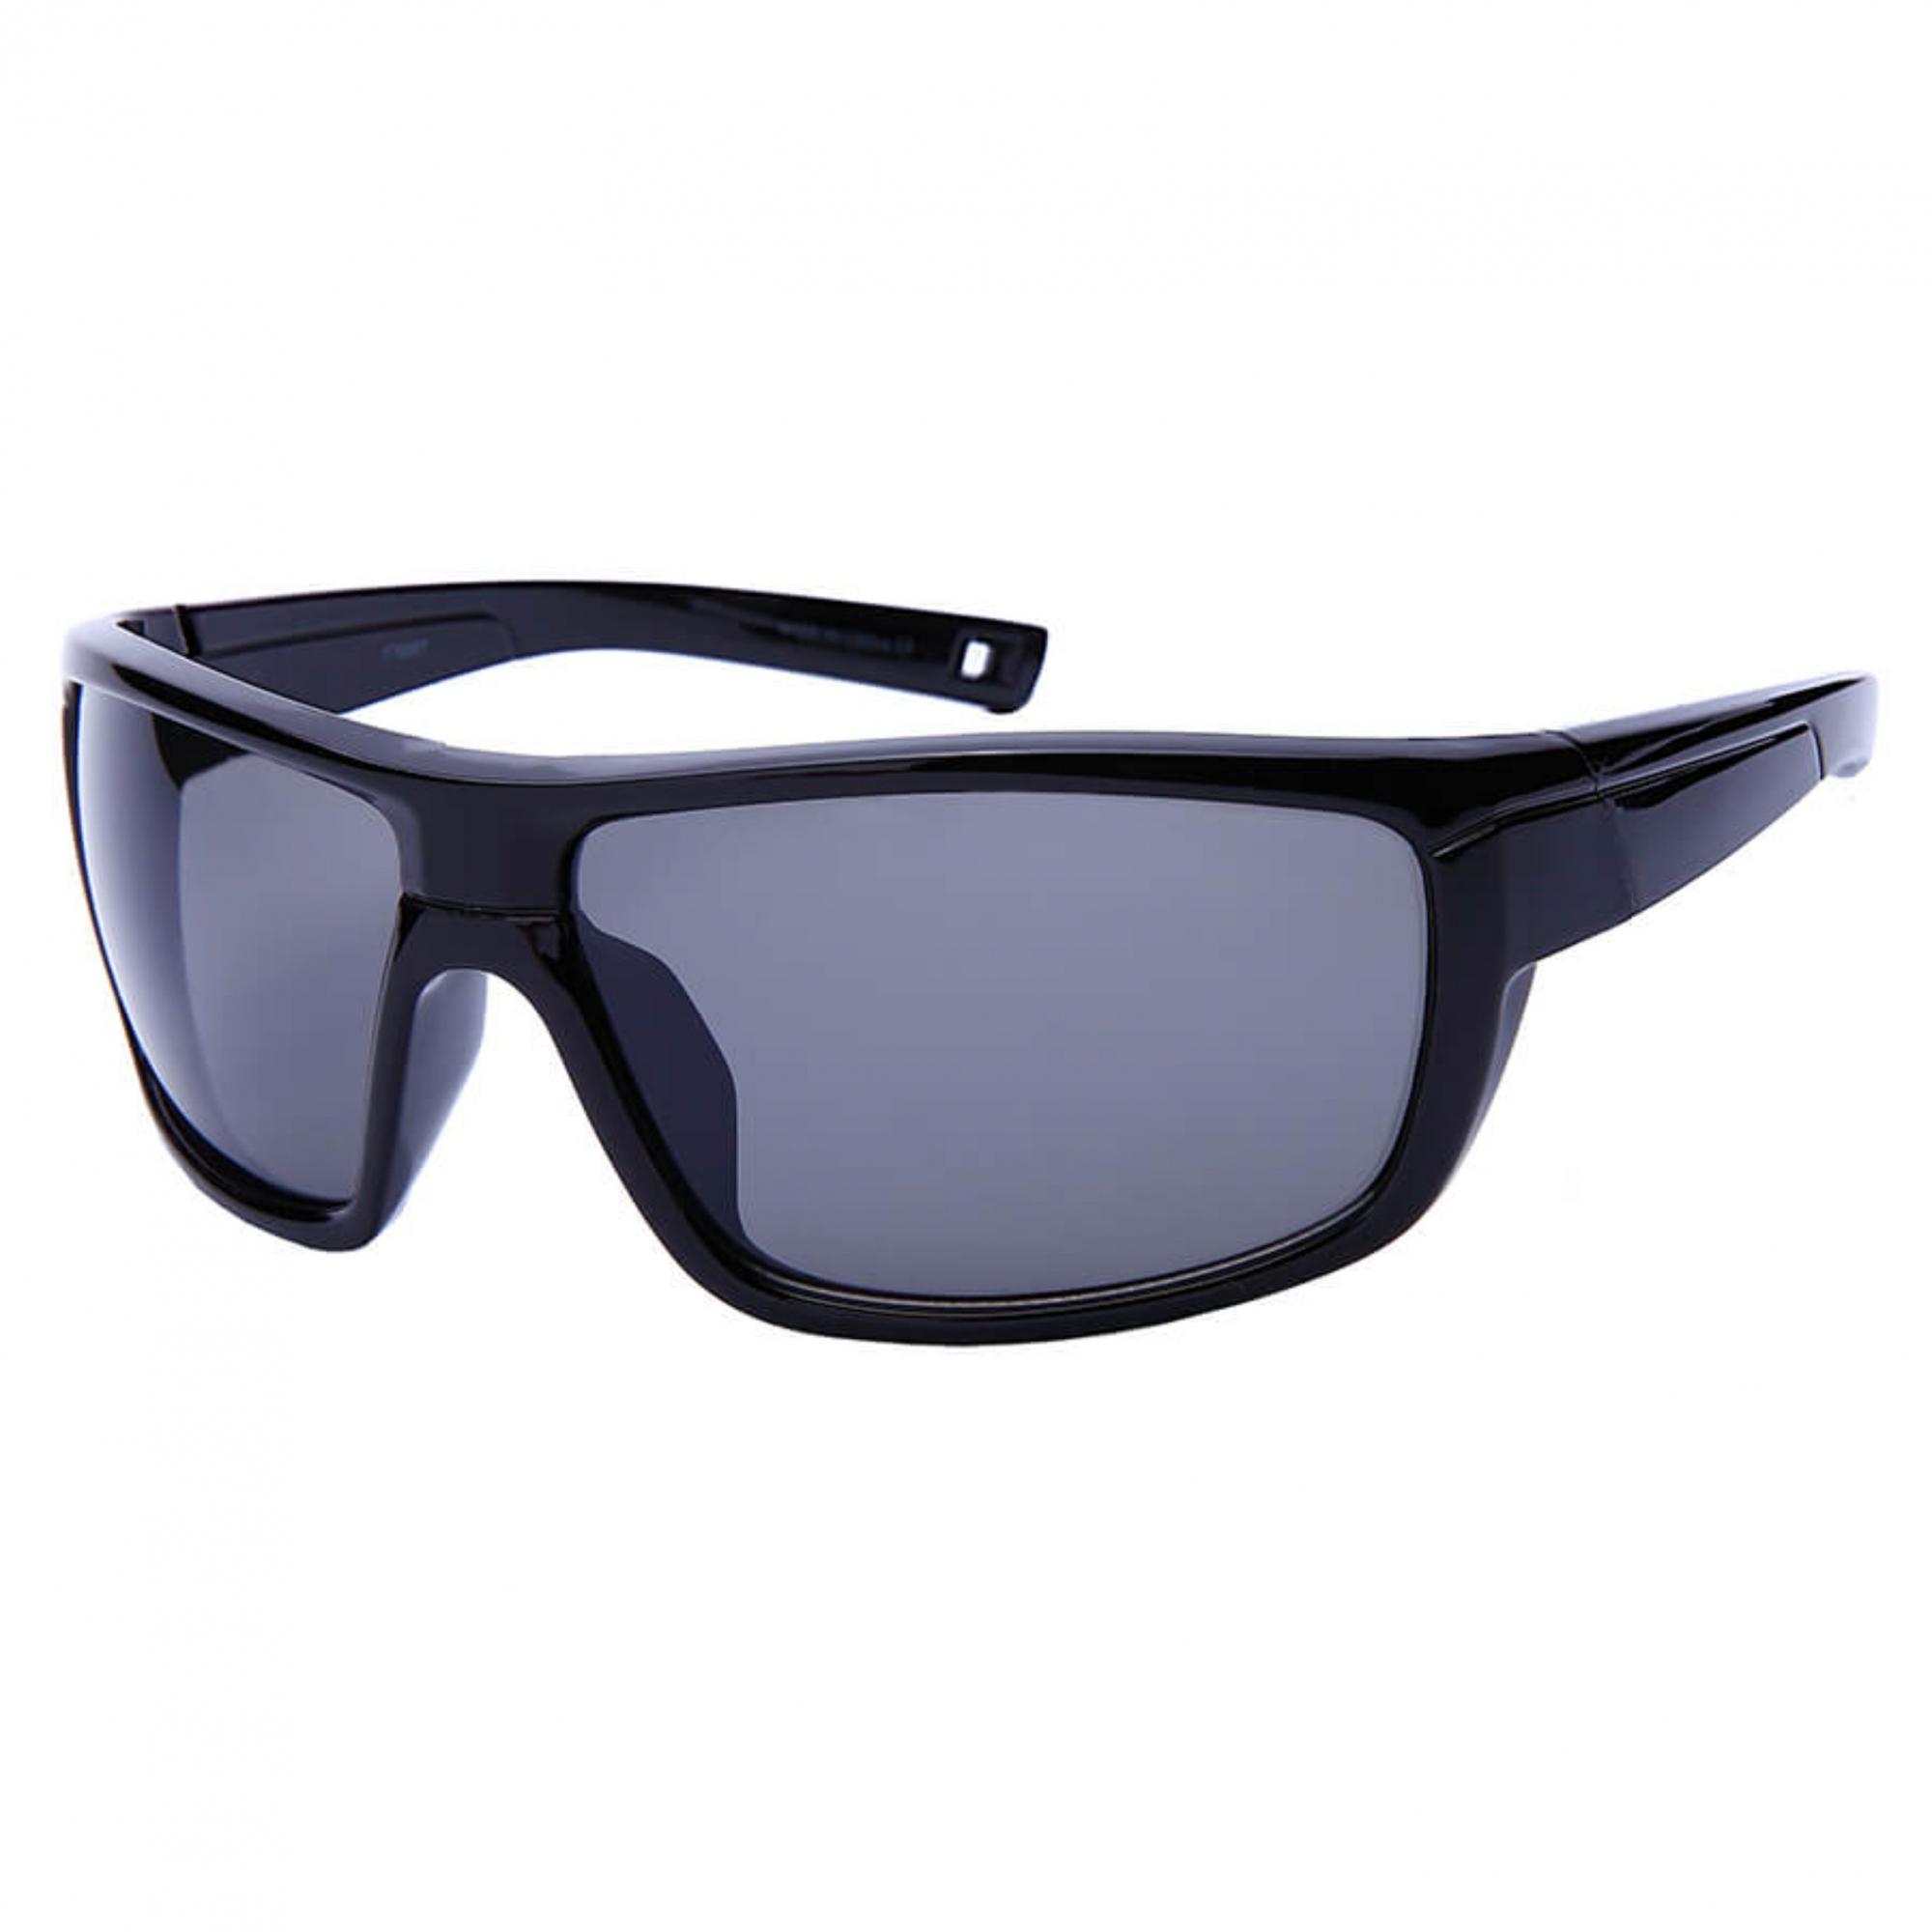 Óculos de Sol Polarizado Express Tocantins Preto